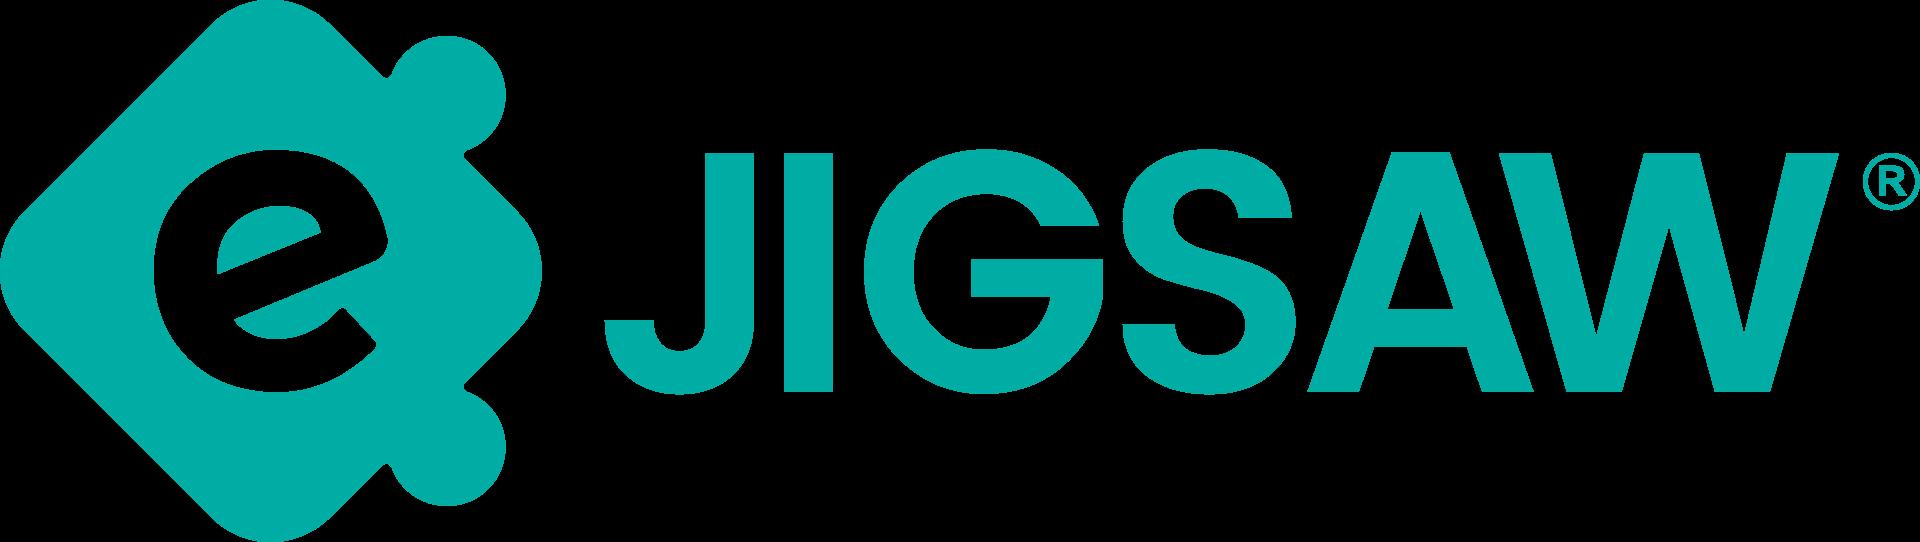 e Jigsaw